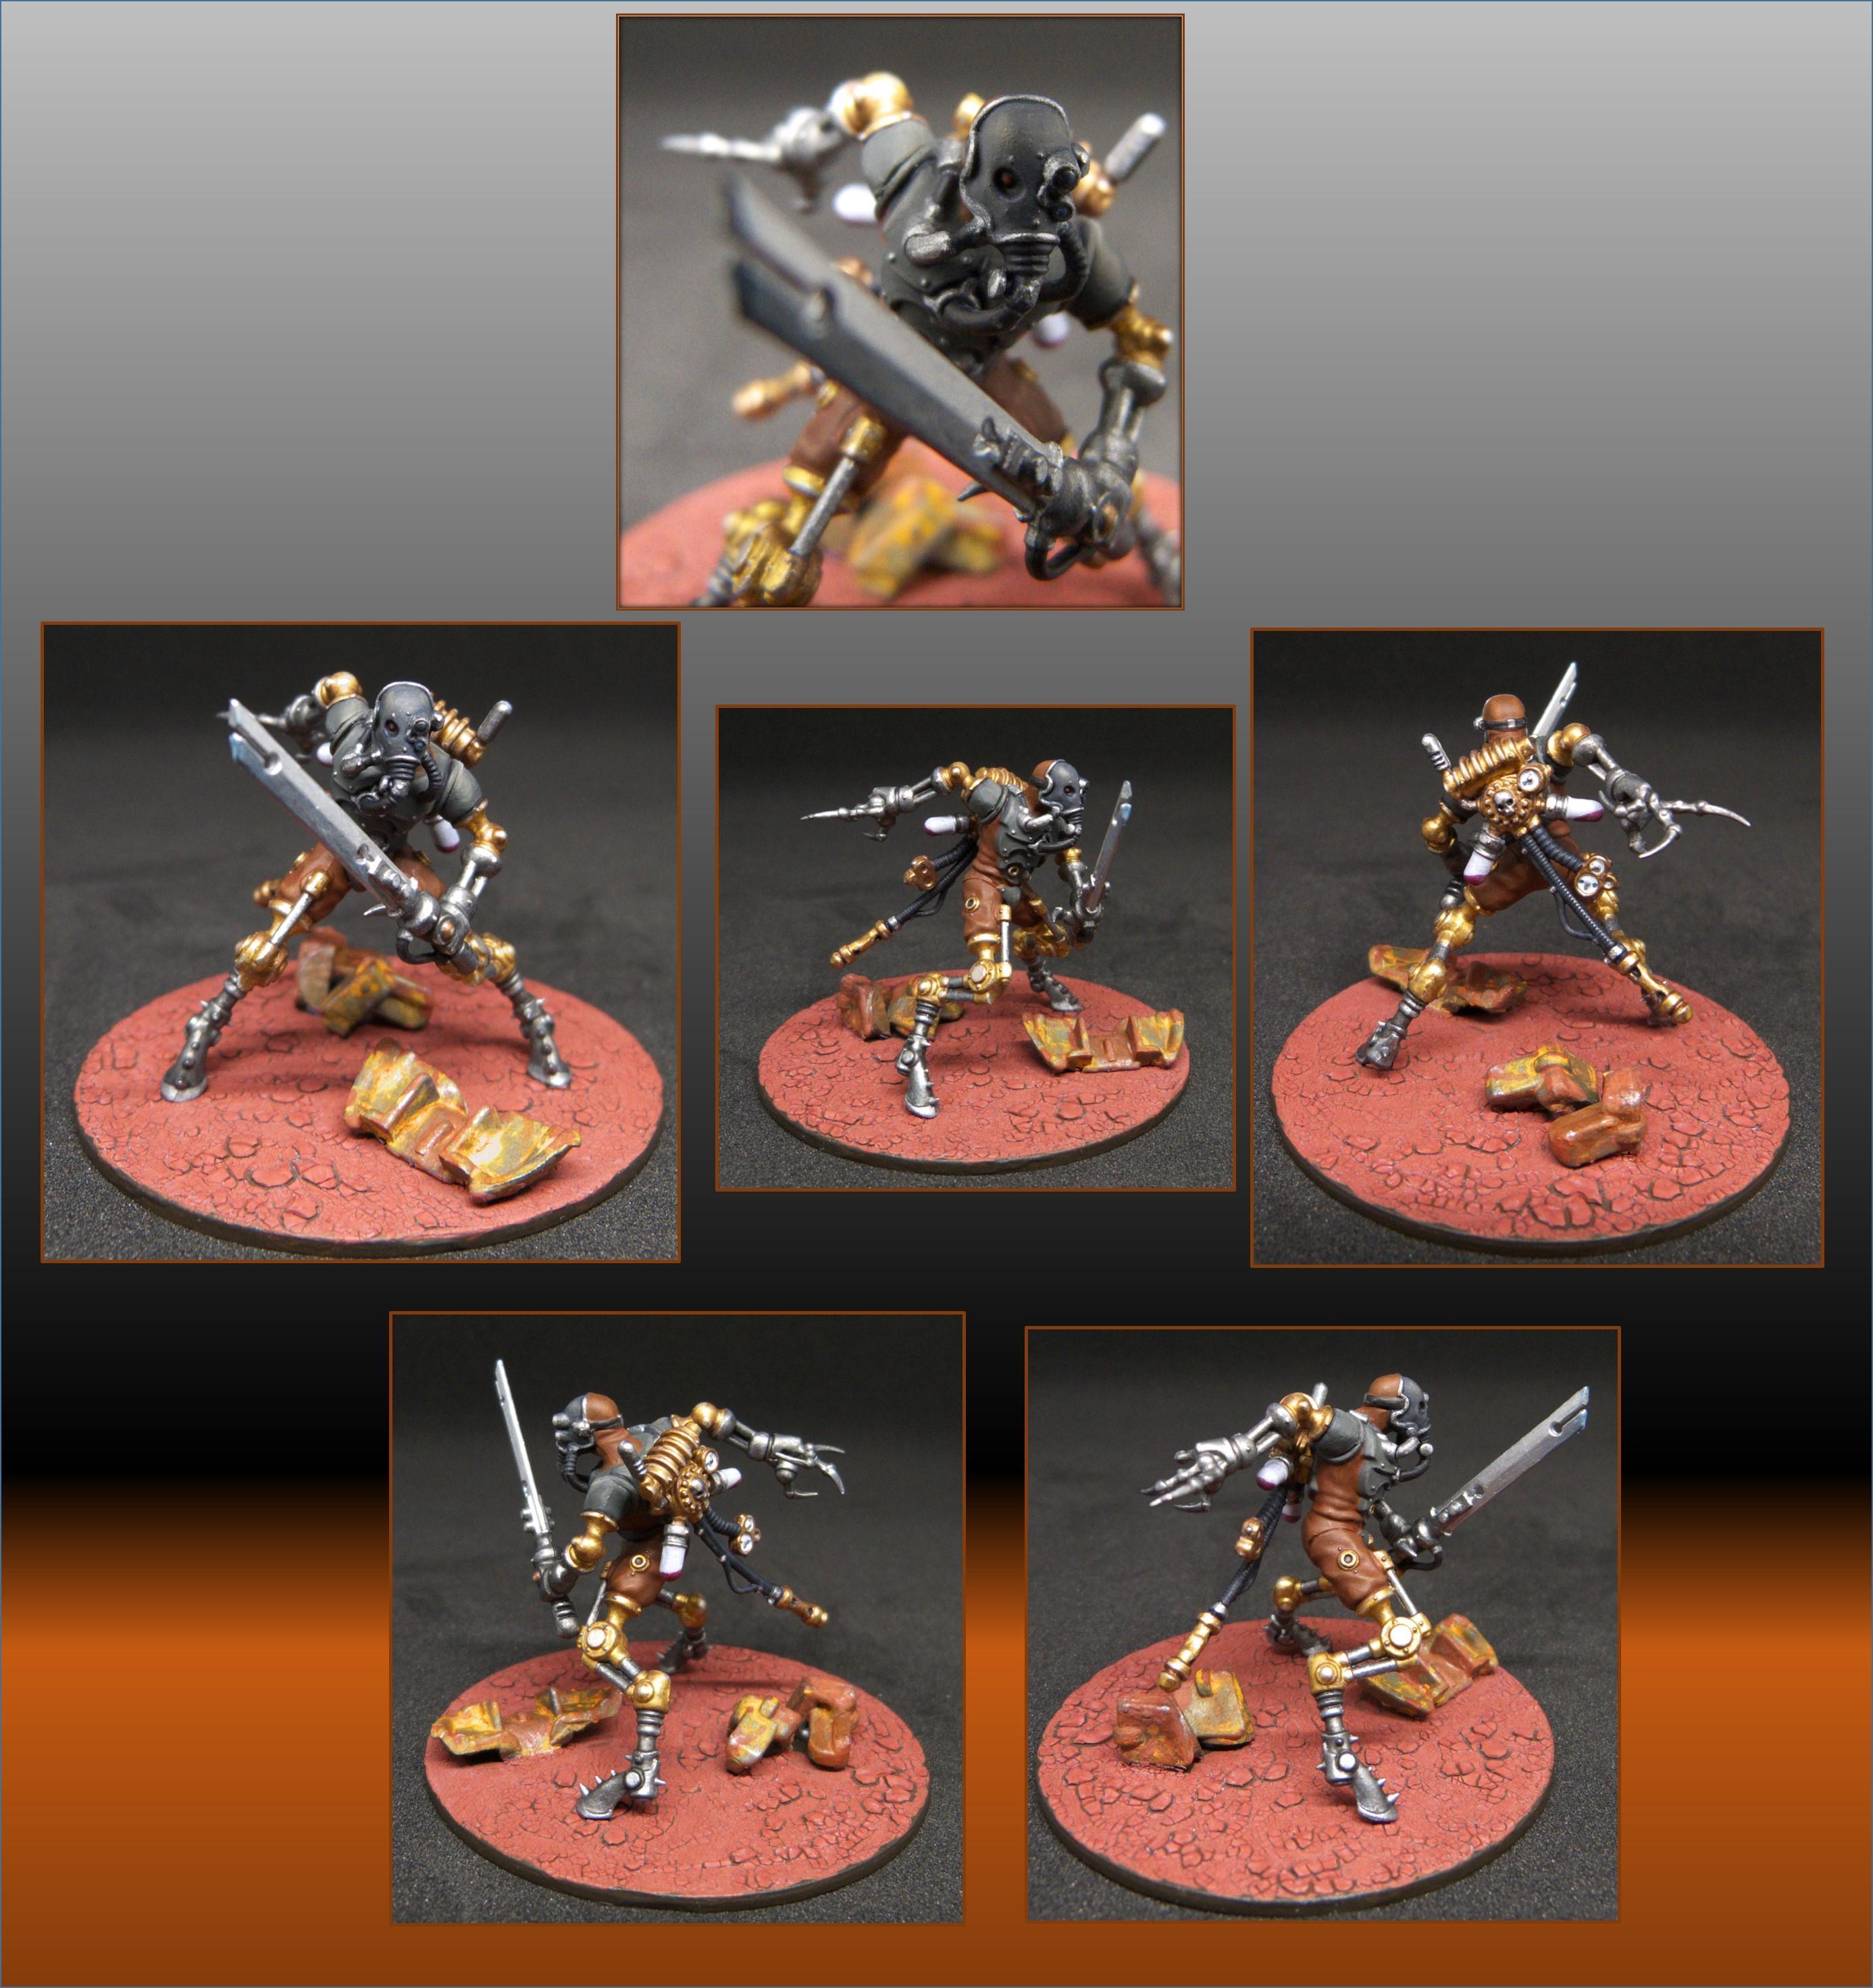 Adeptus Mechanicus, Cyborg, Rust, Ruststalker, Sicarians, Warhammer 40,000